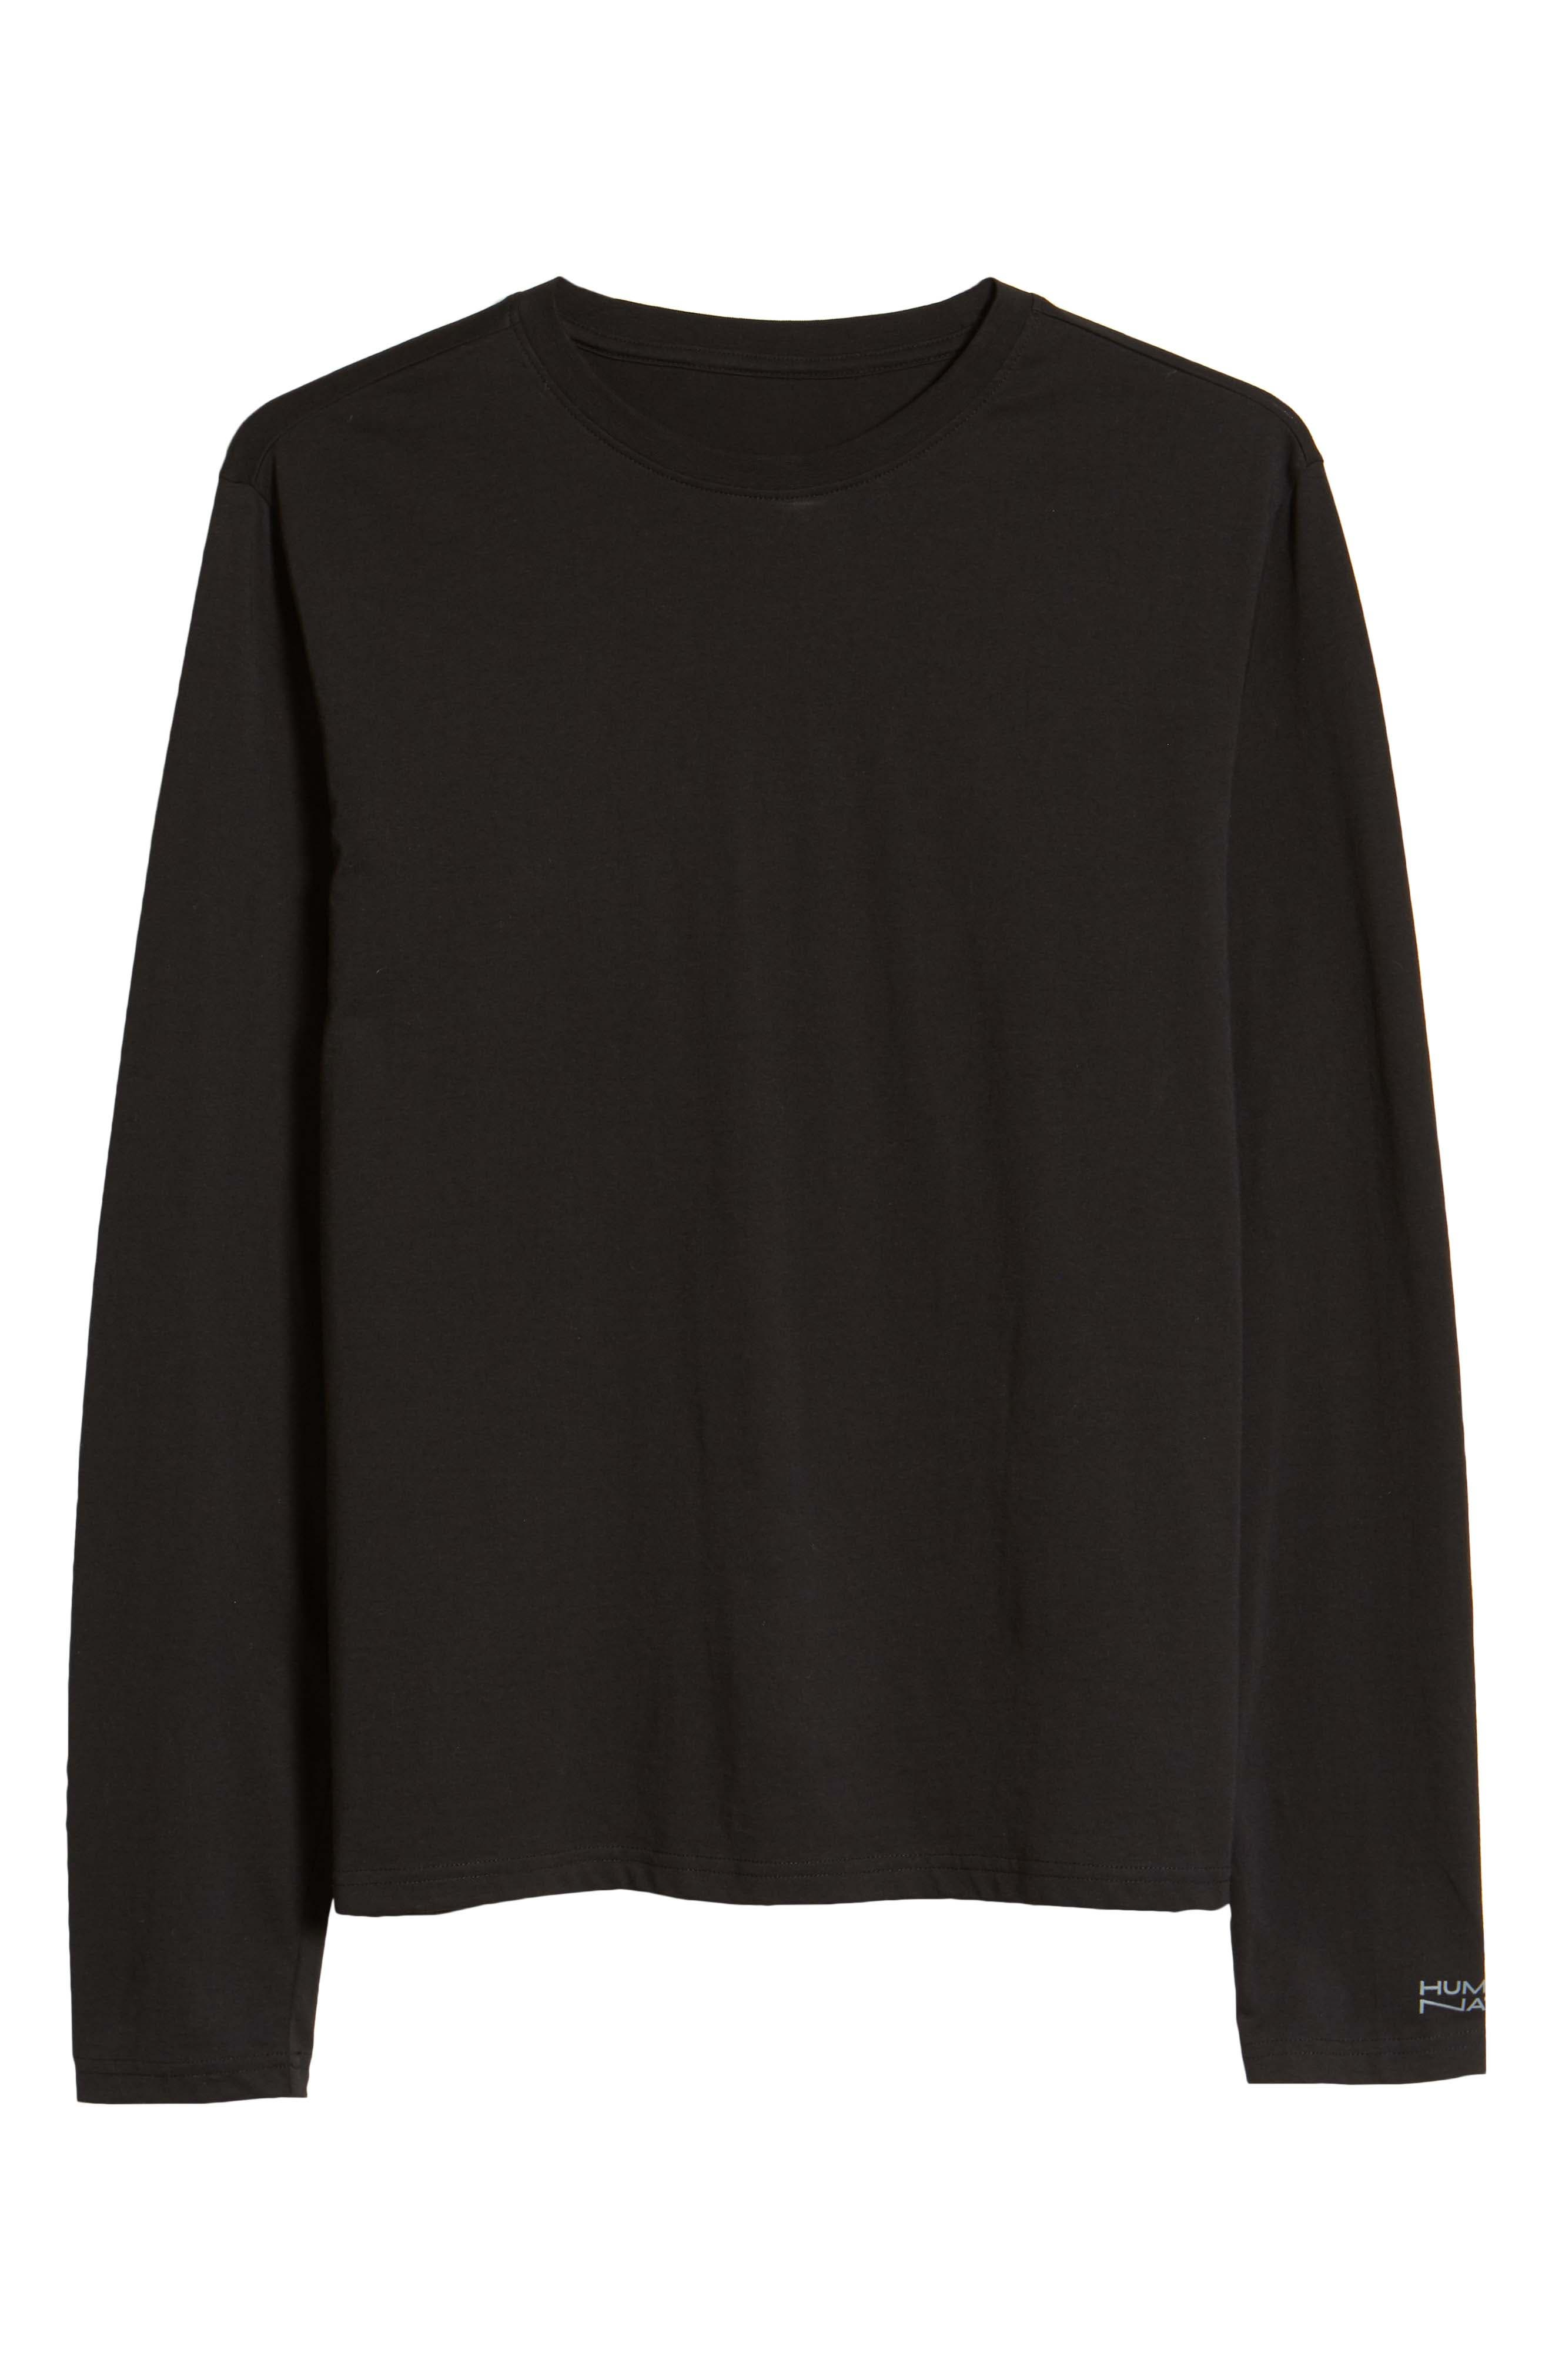 Gender Inclusive Organic Cotton Long Sleeve T-Shirt